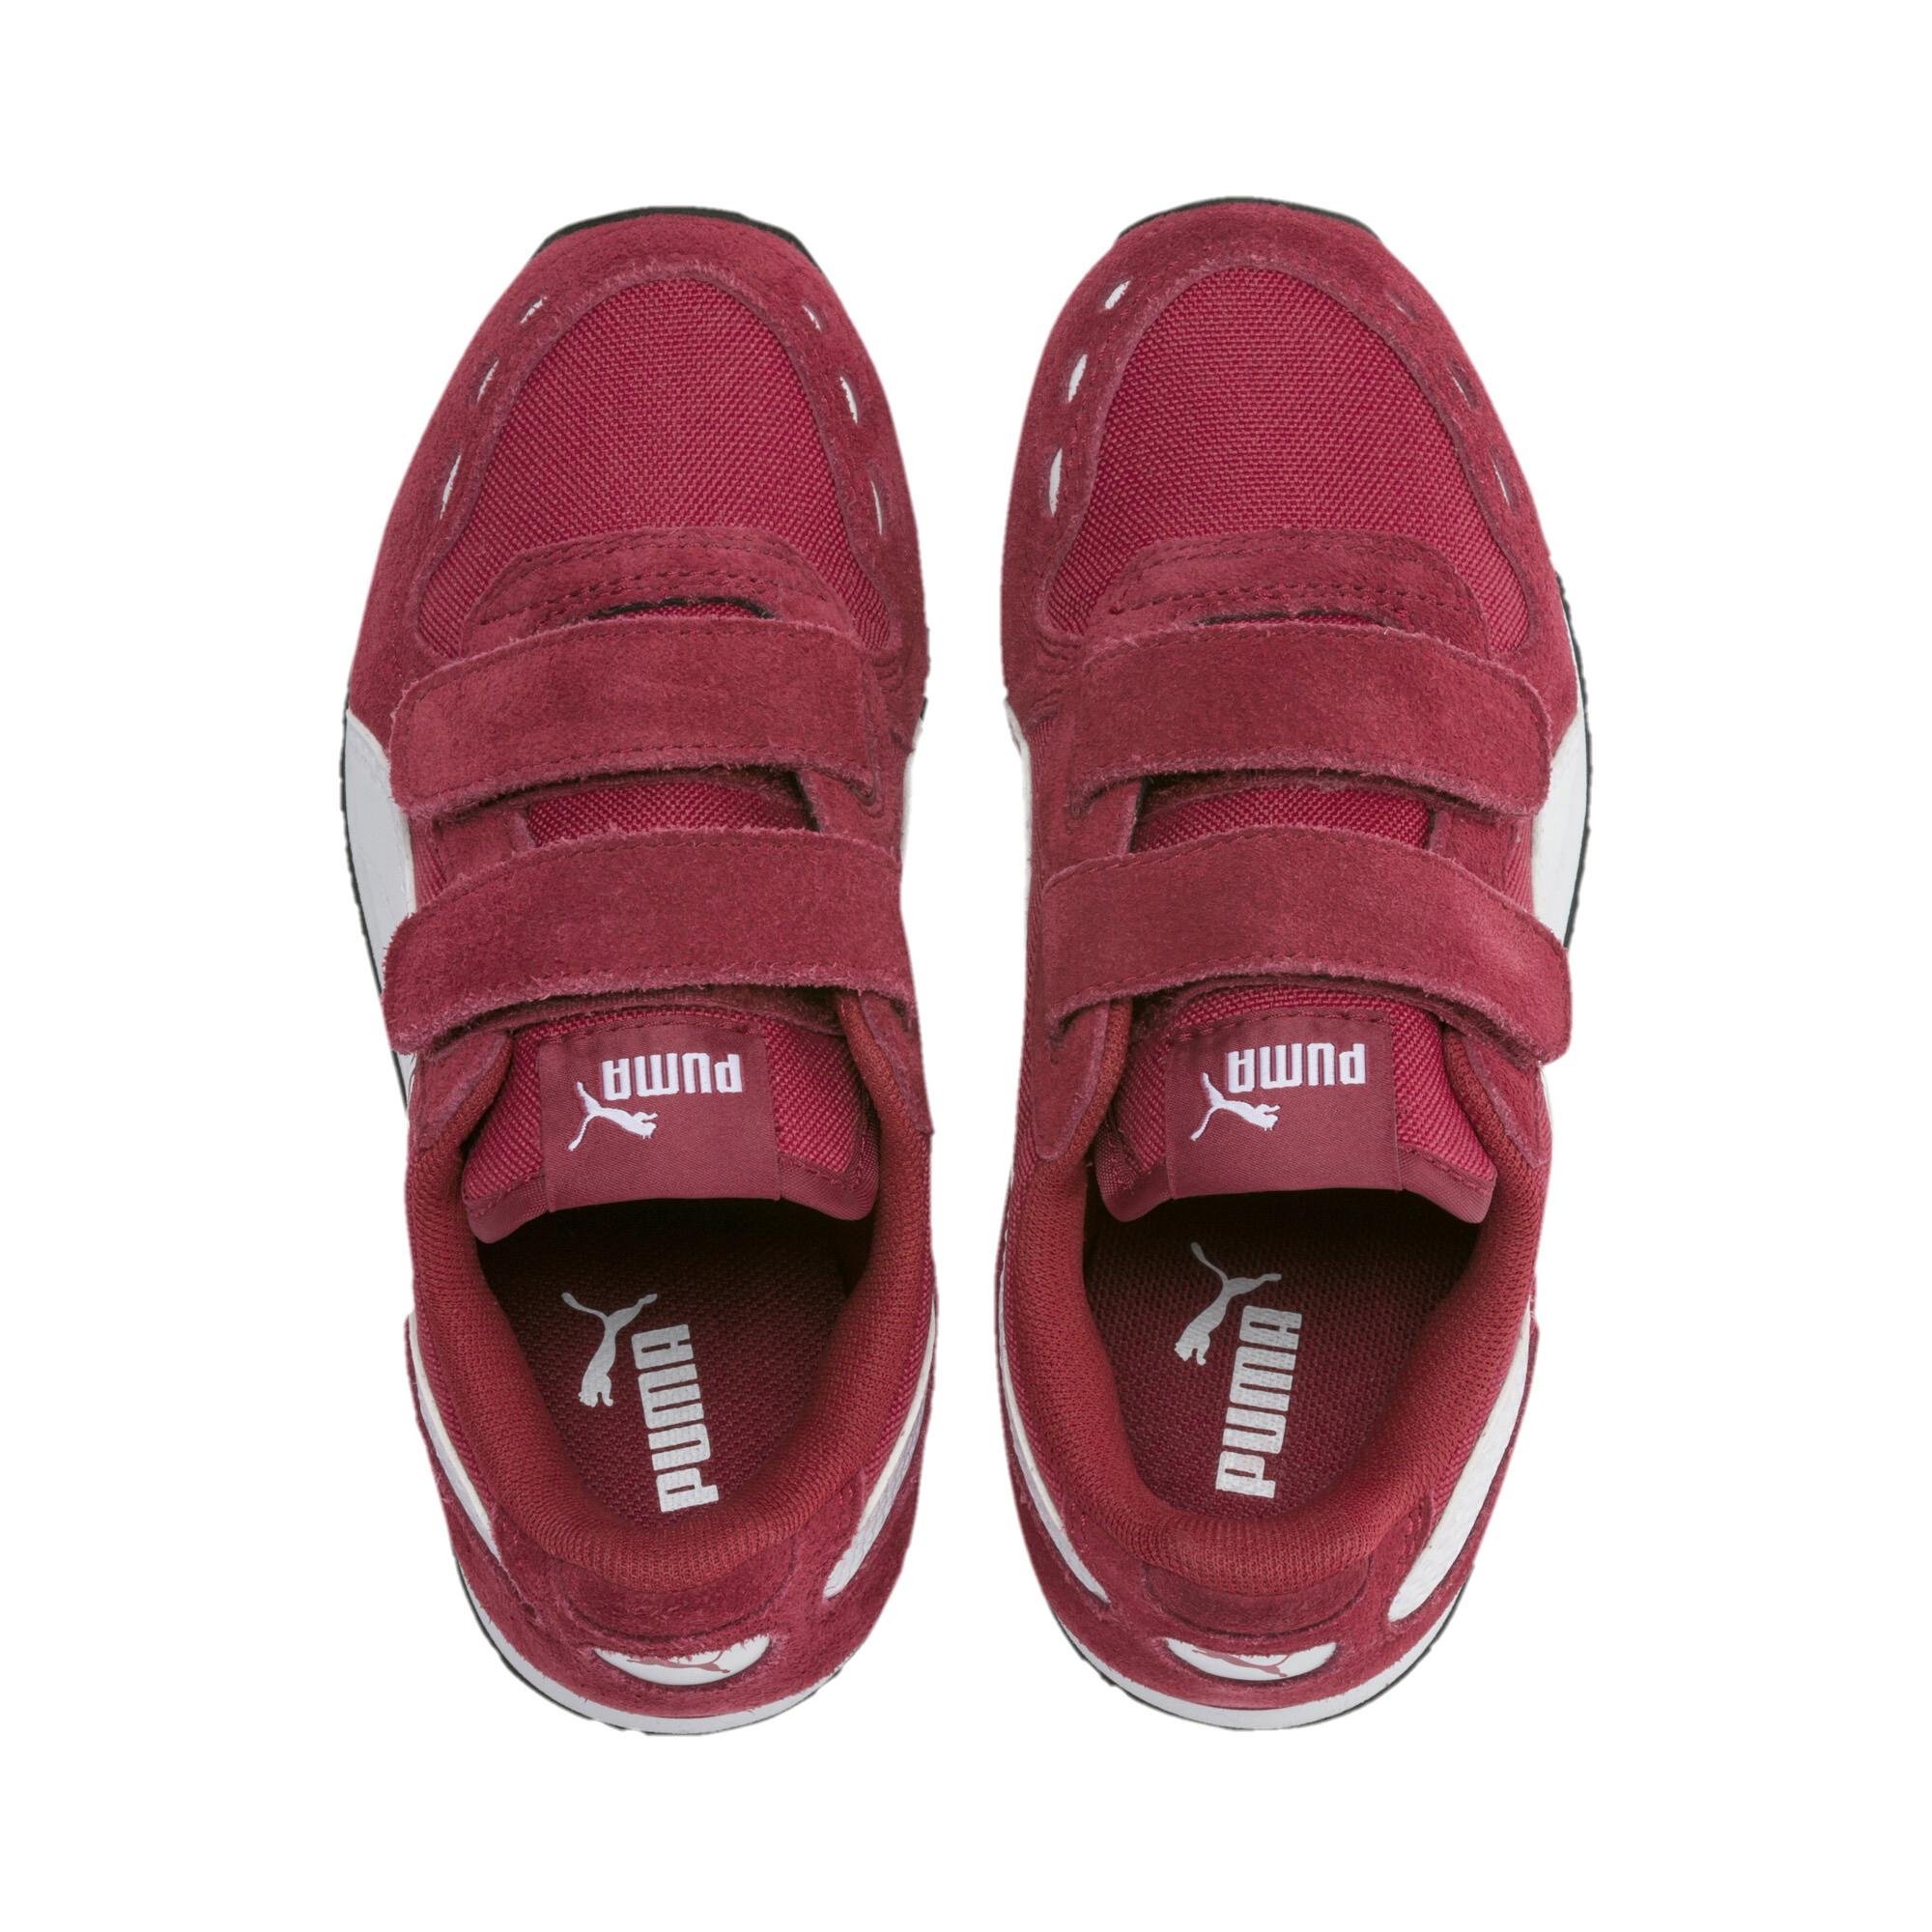 PUMA-Cabana-Racer-Little-Kids-039-Shoes-Kids-Shoe-Kids thumbnail 7